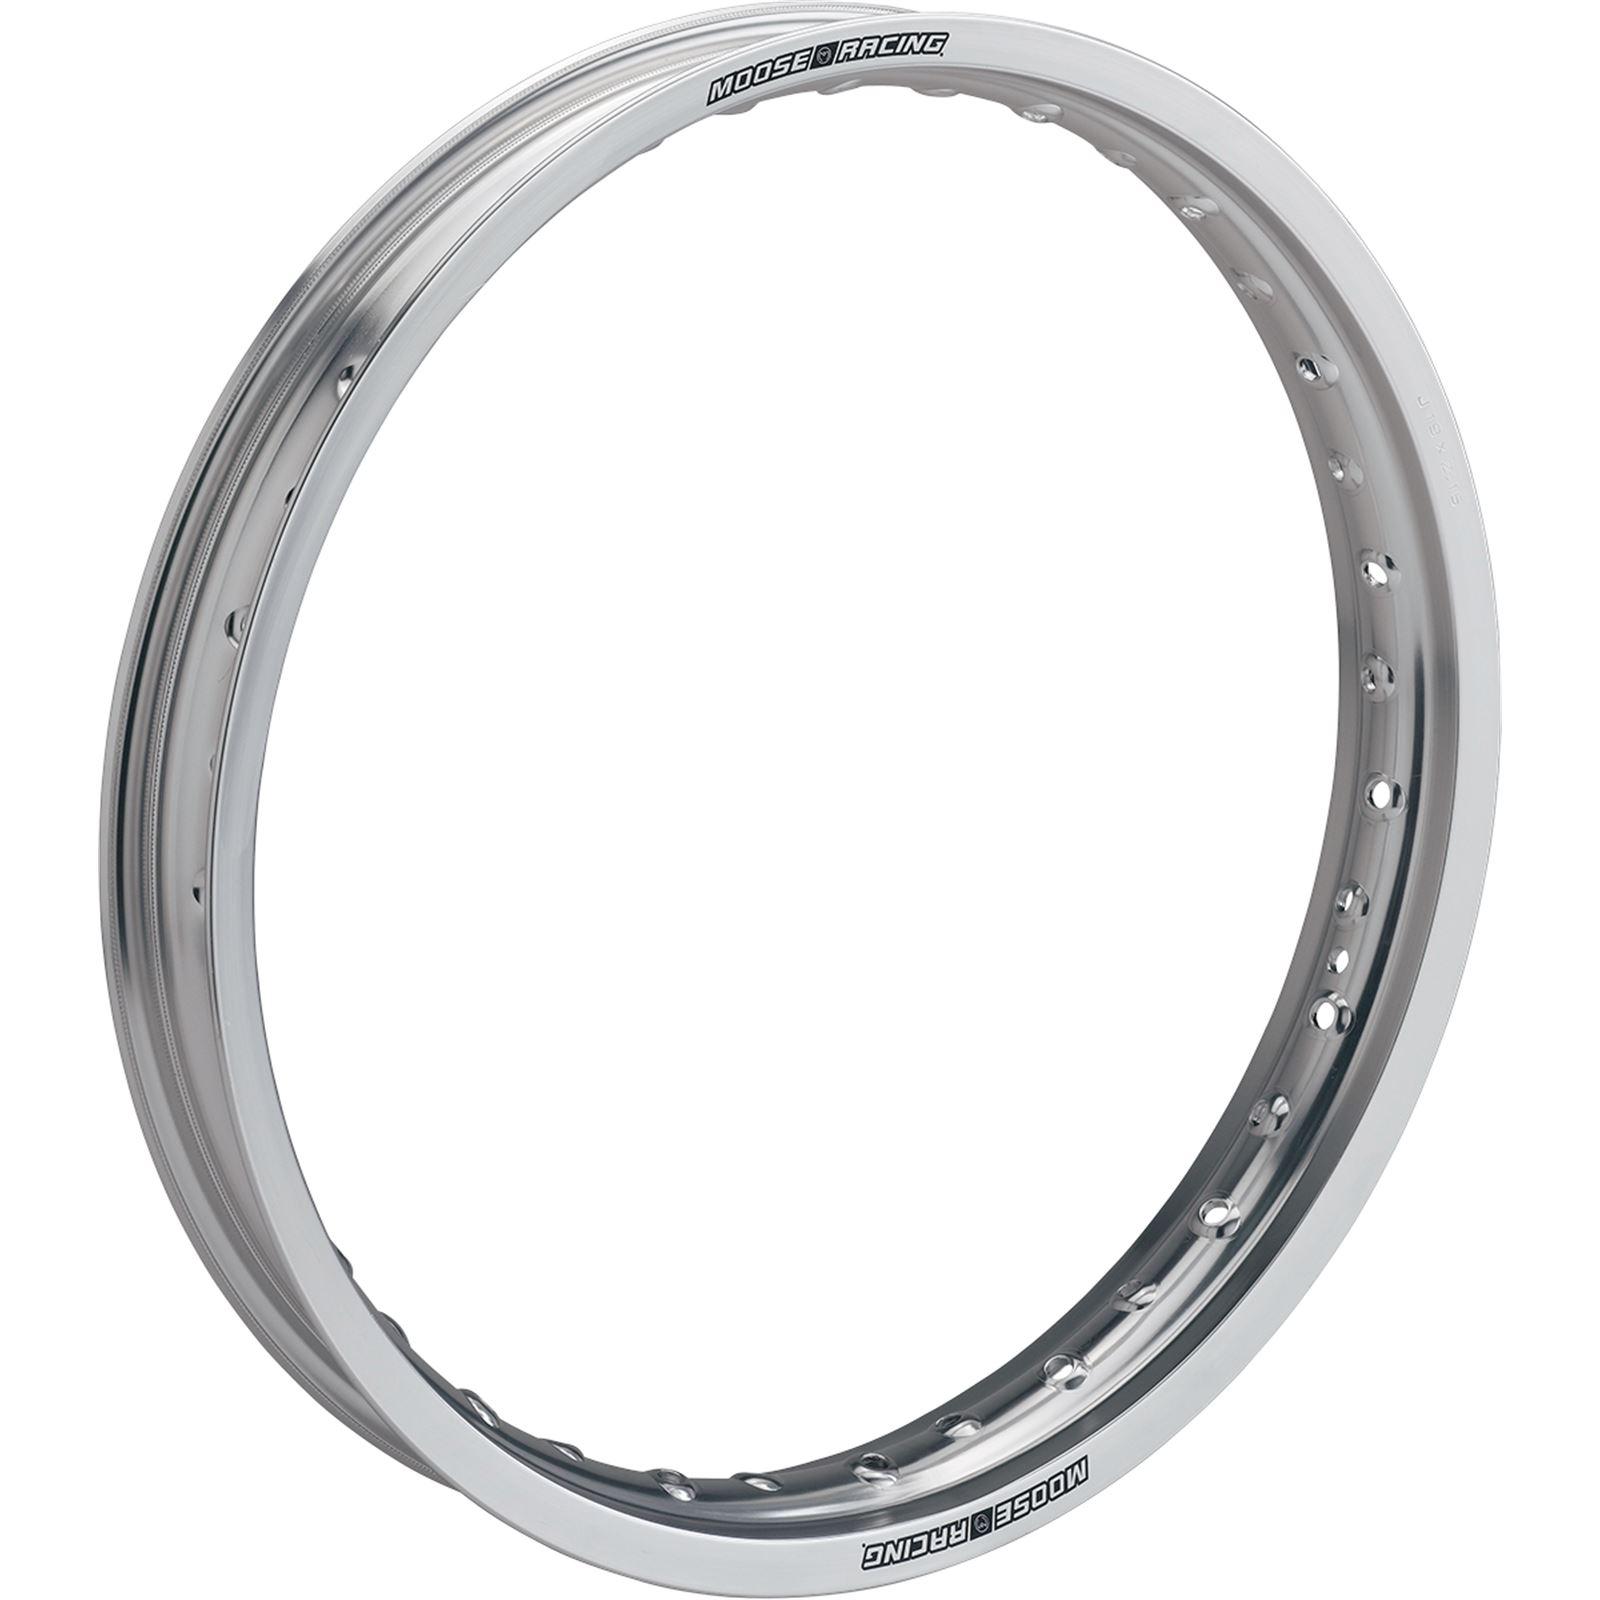 Moose Racing Rim Rear Silver 18 x 2.15 32H